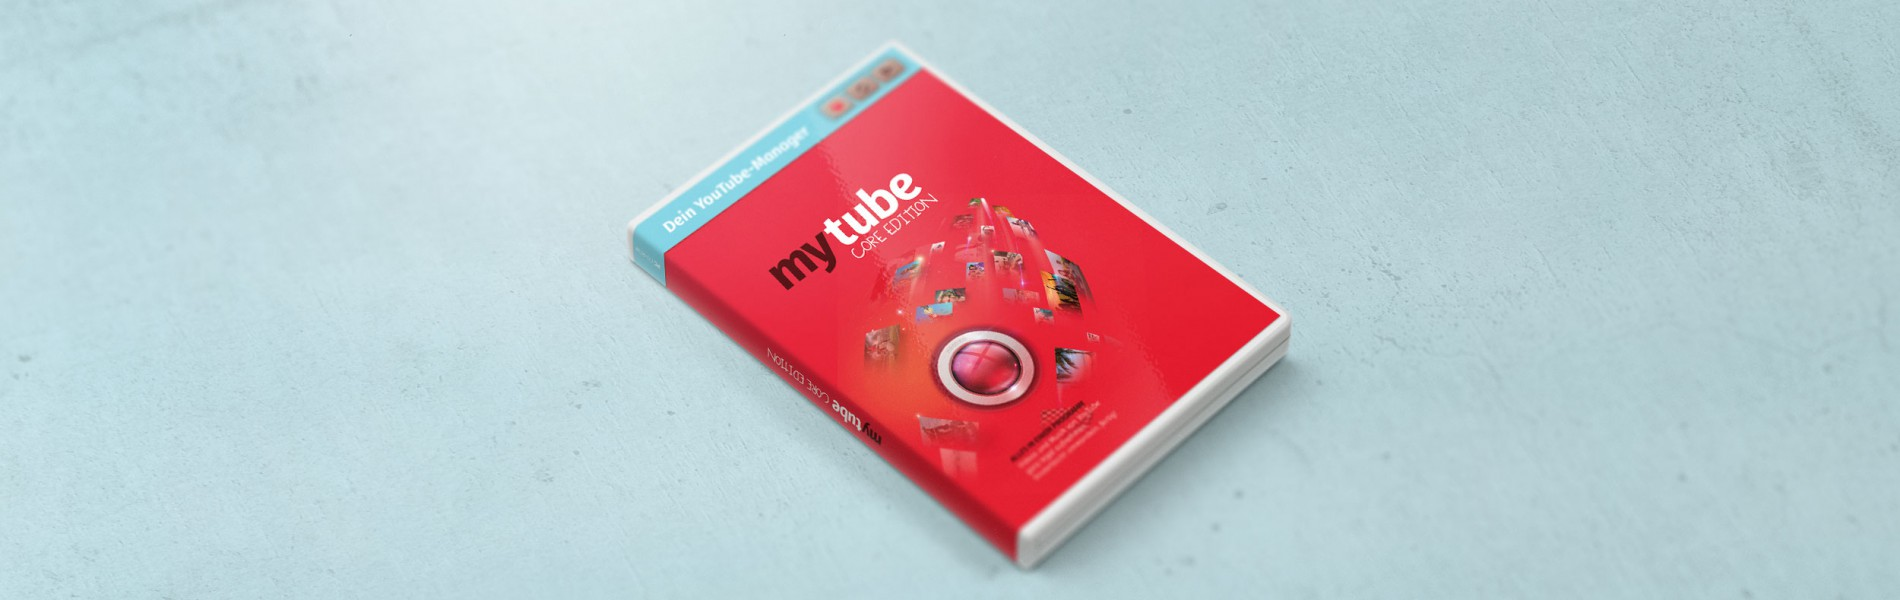 Mytube Core Edition